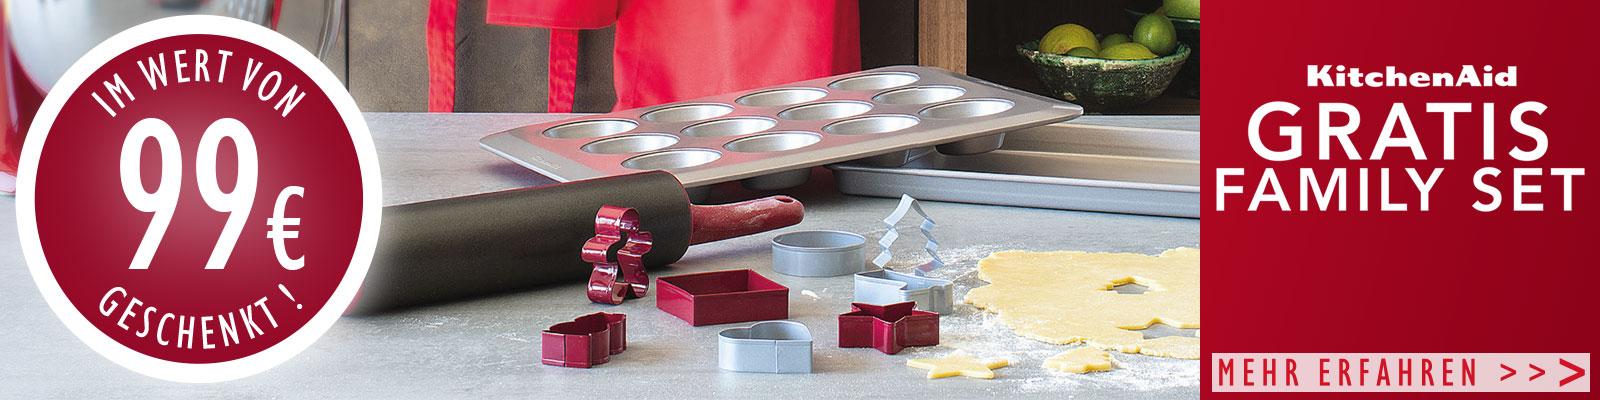 Kitchenaid Artisan Cook Processor Ramershoven Com